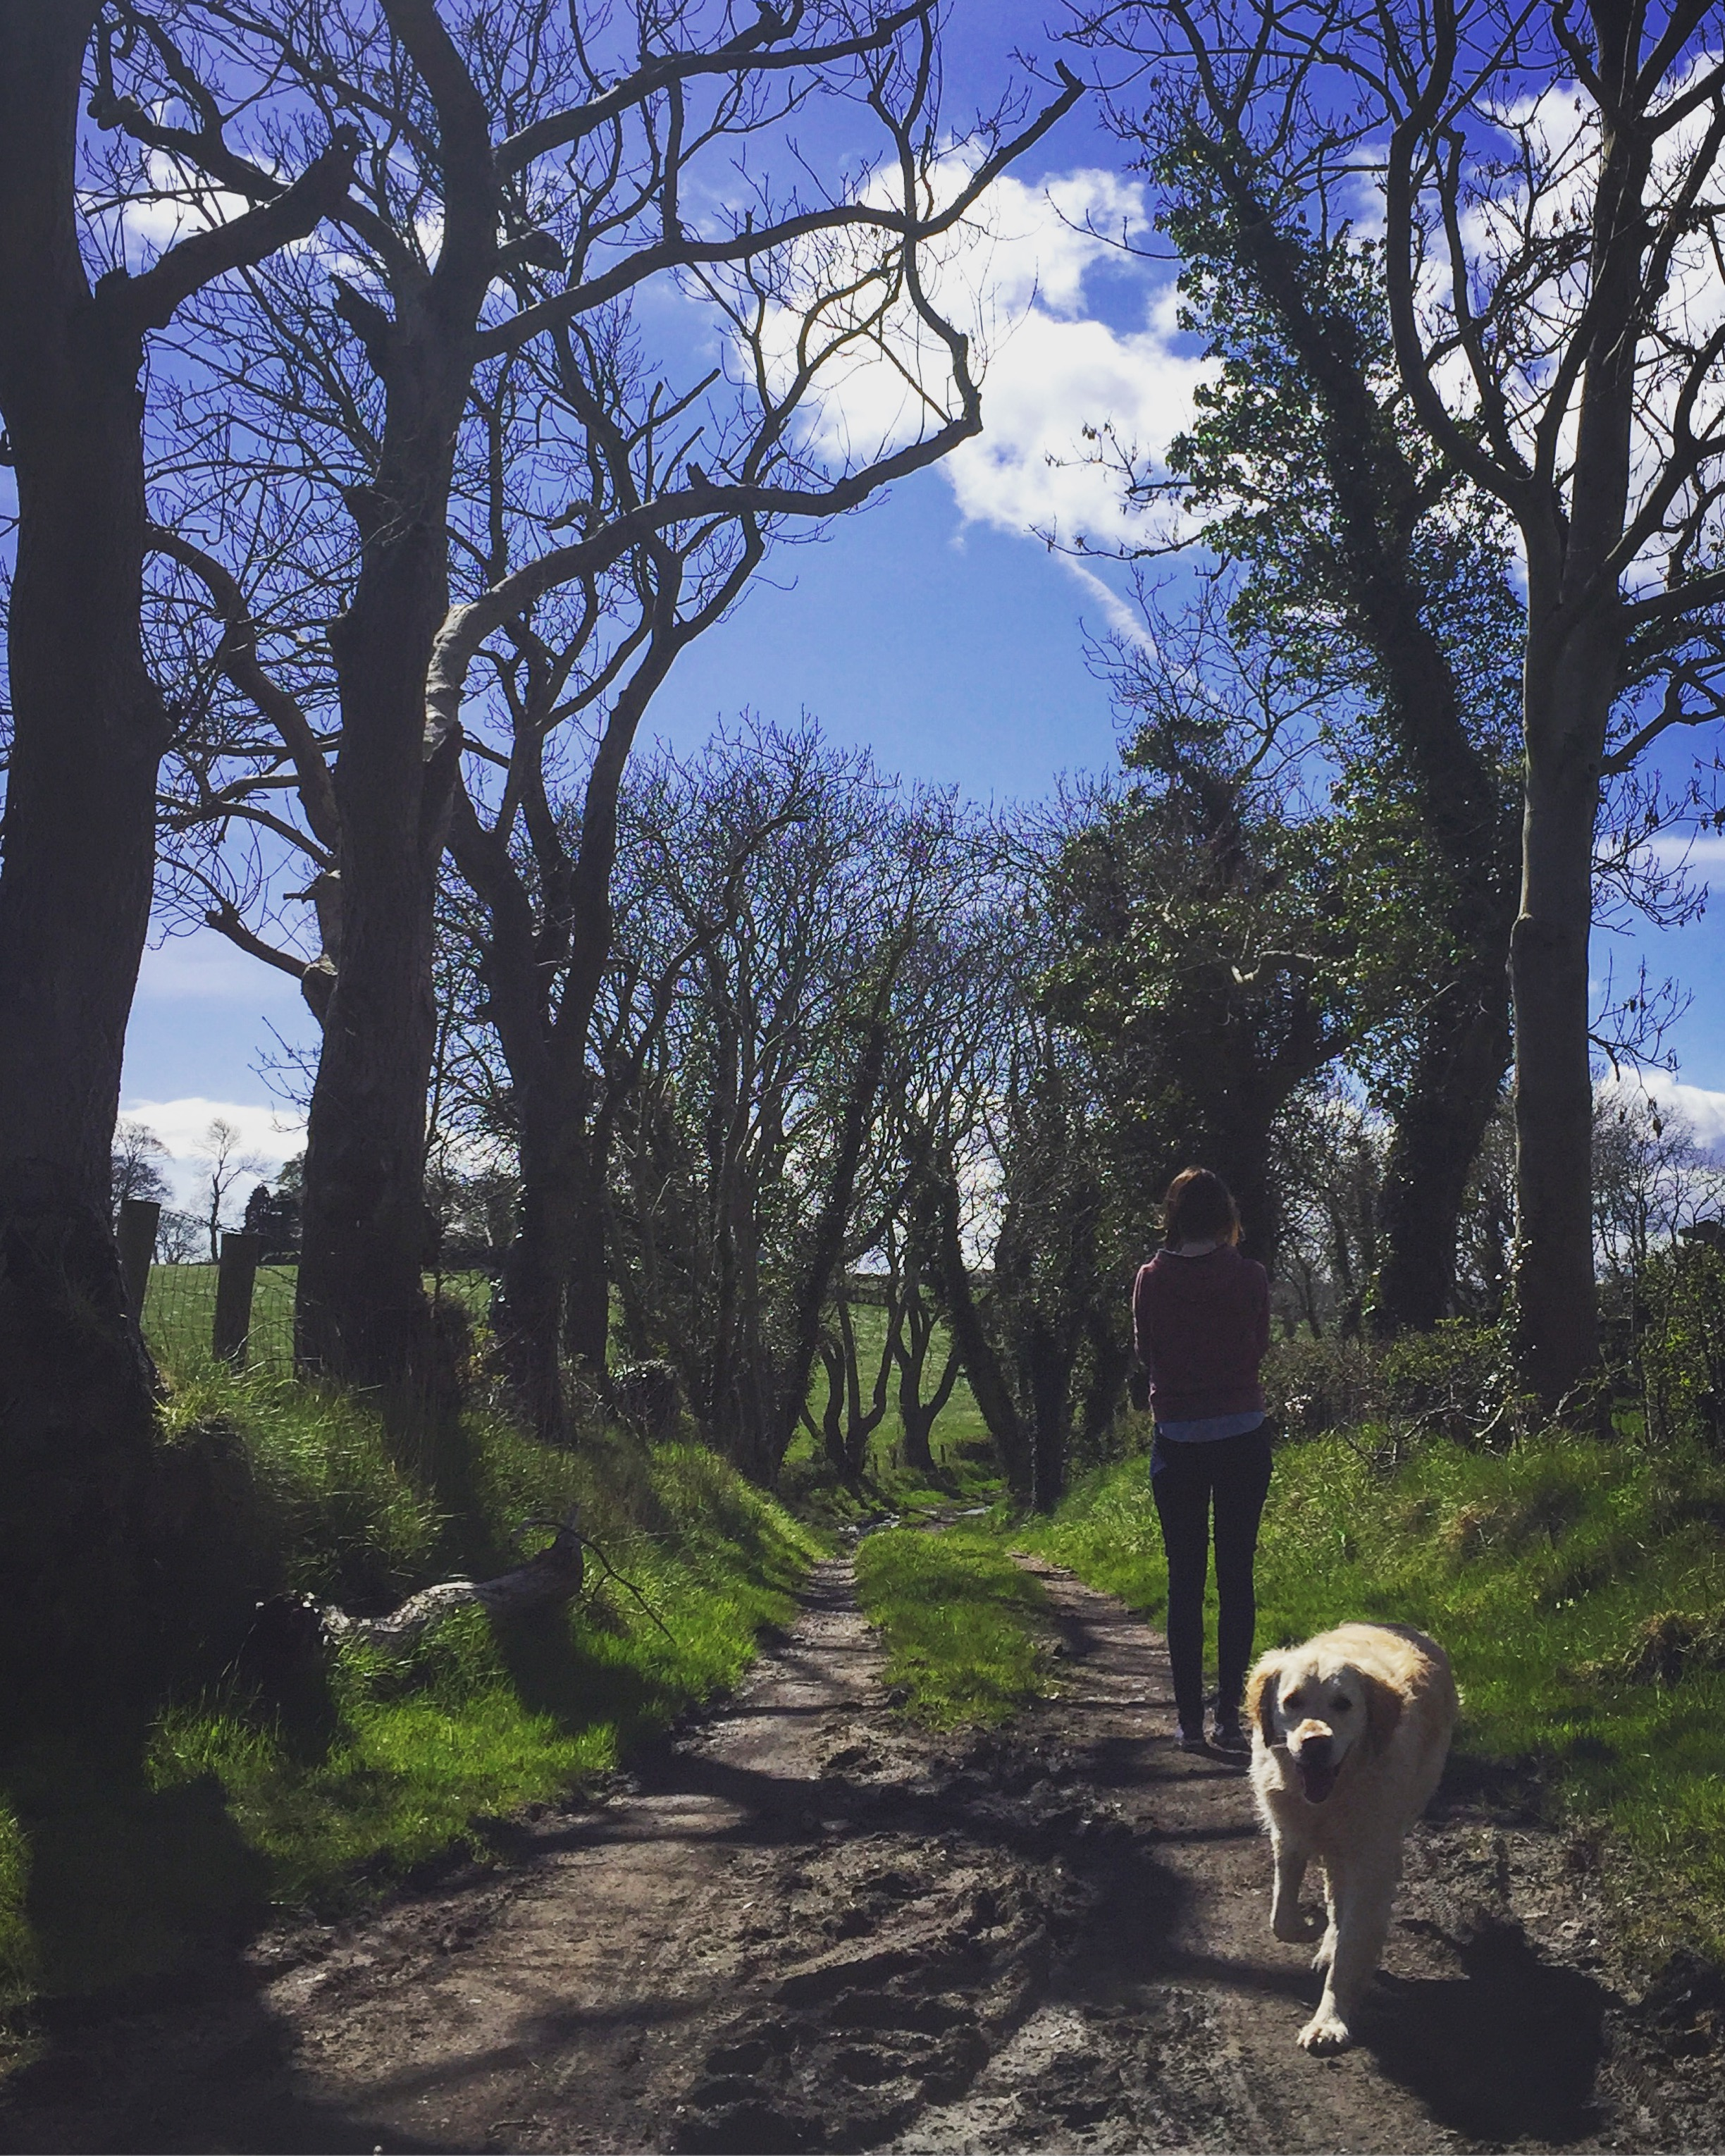 lane_country_helens_bay_to_crawfordsburn_roadtrip_coast_ni_explorer_niexplorer_northern_ireland_blog.jpg